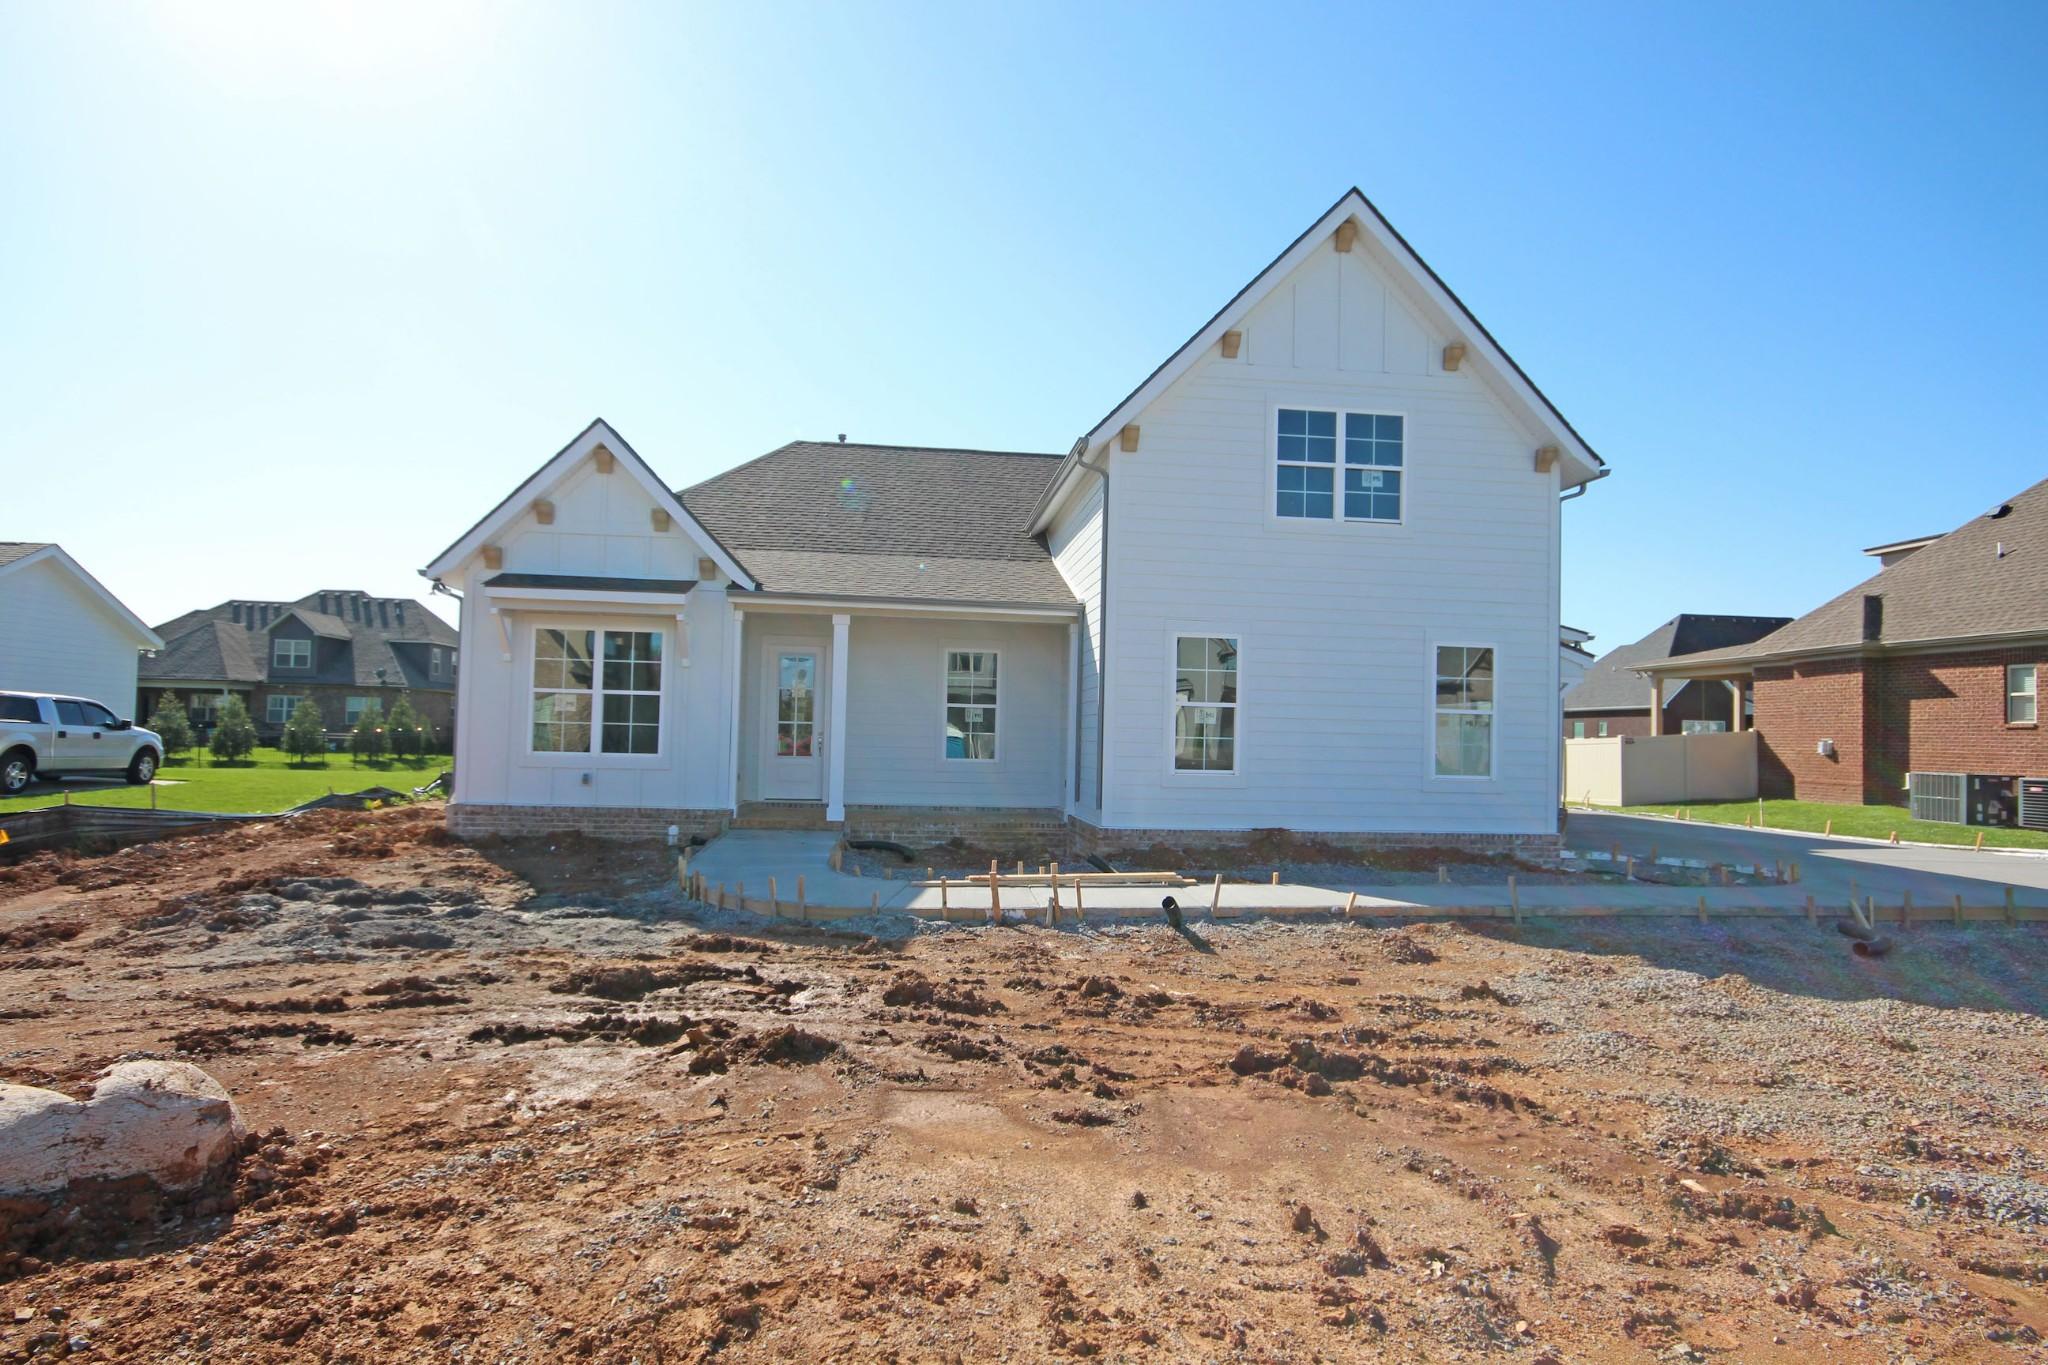 2817 Bertram Ct Property Photo - Murfreesboro, TN real estate listing